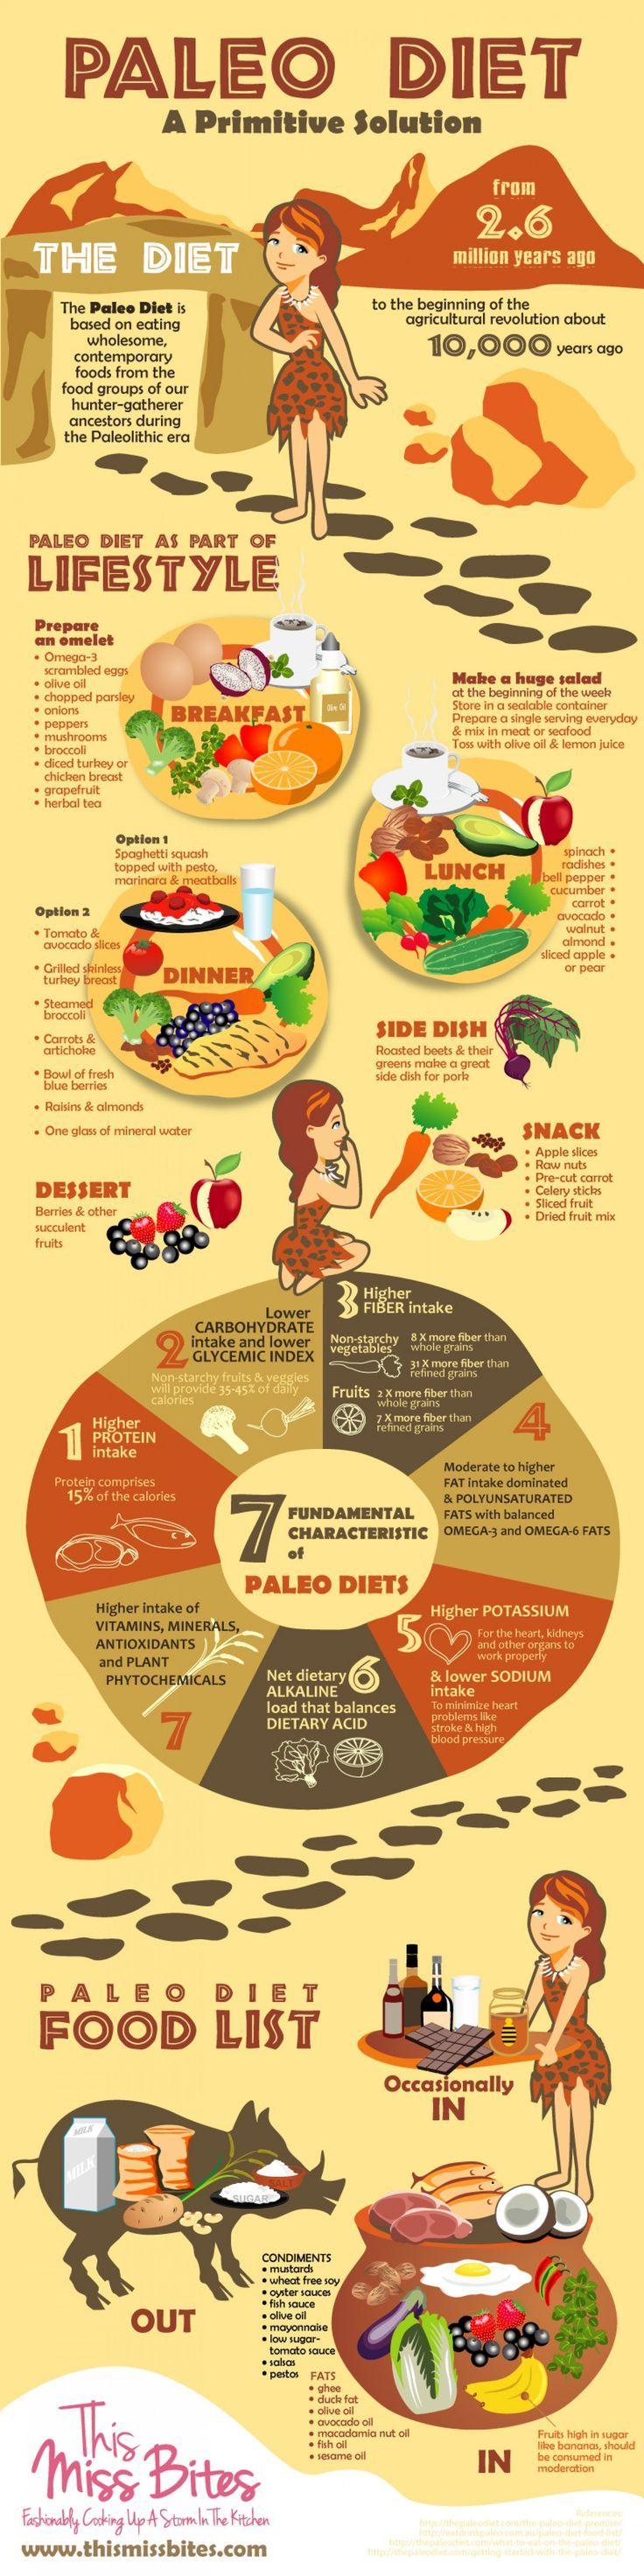 Good Diet Meals Paleolithic Diet - Paleo Diet Plan For Beginners [Infographic] - healthnbodytips.com